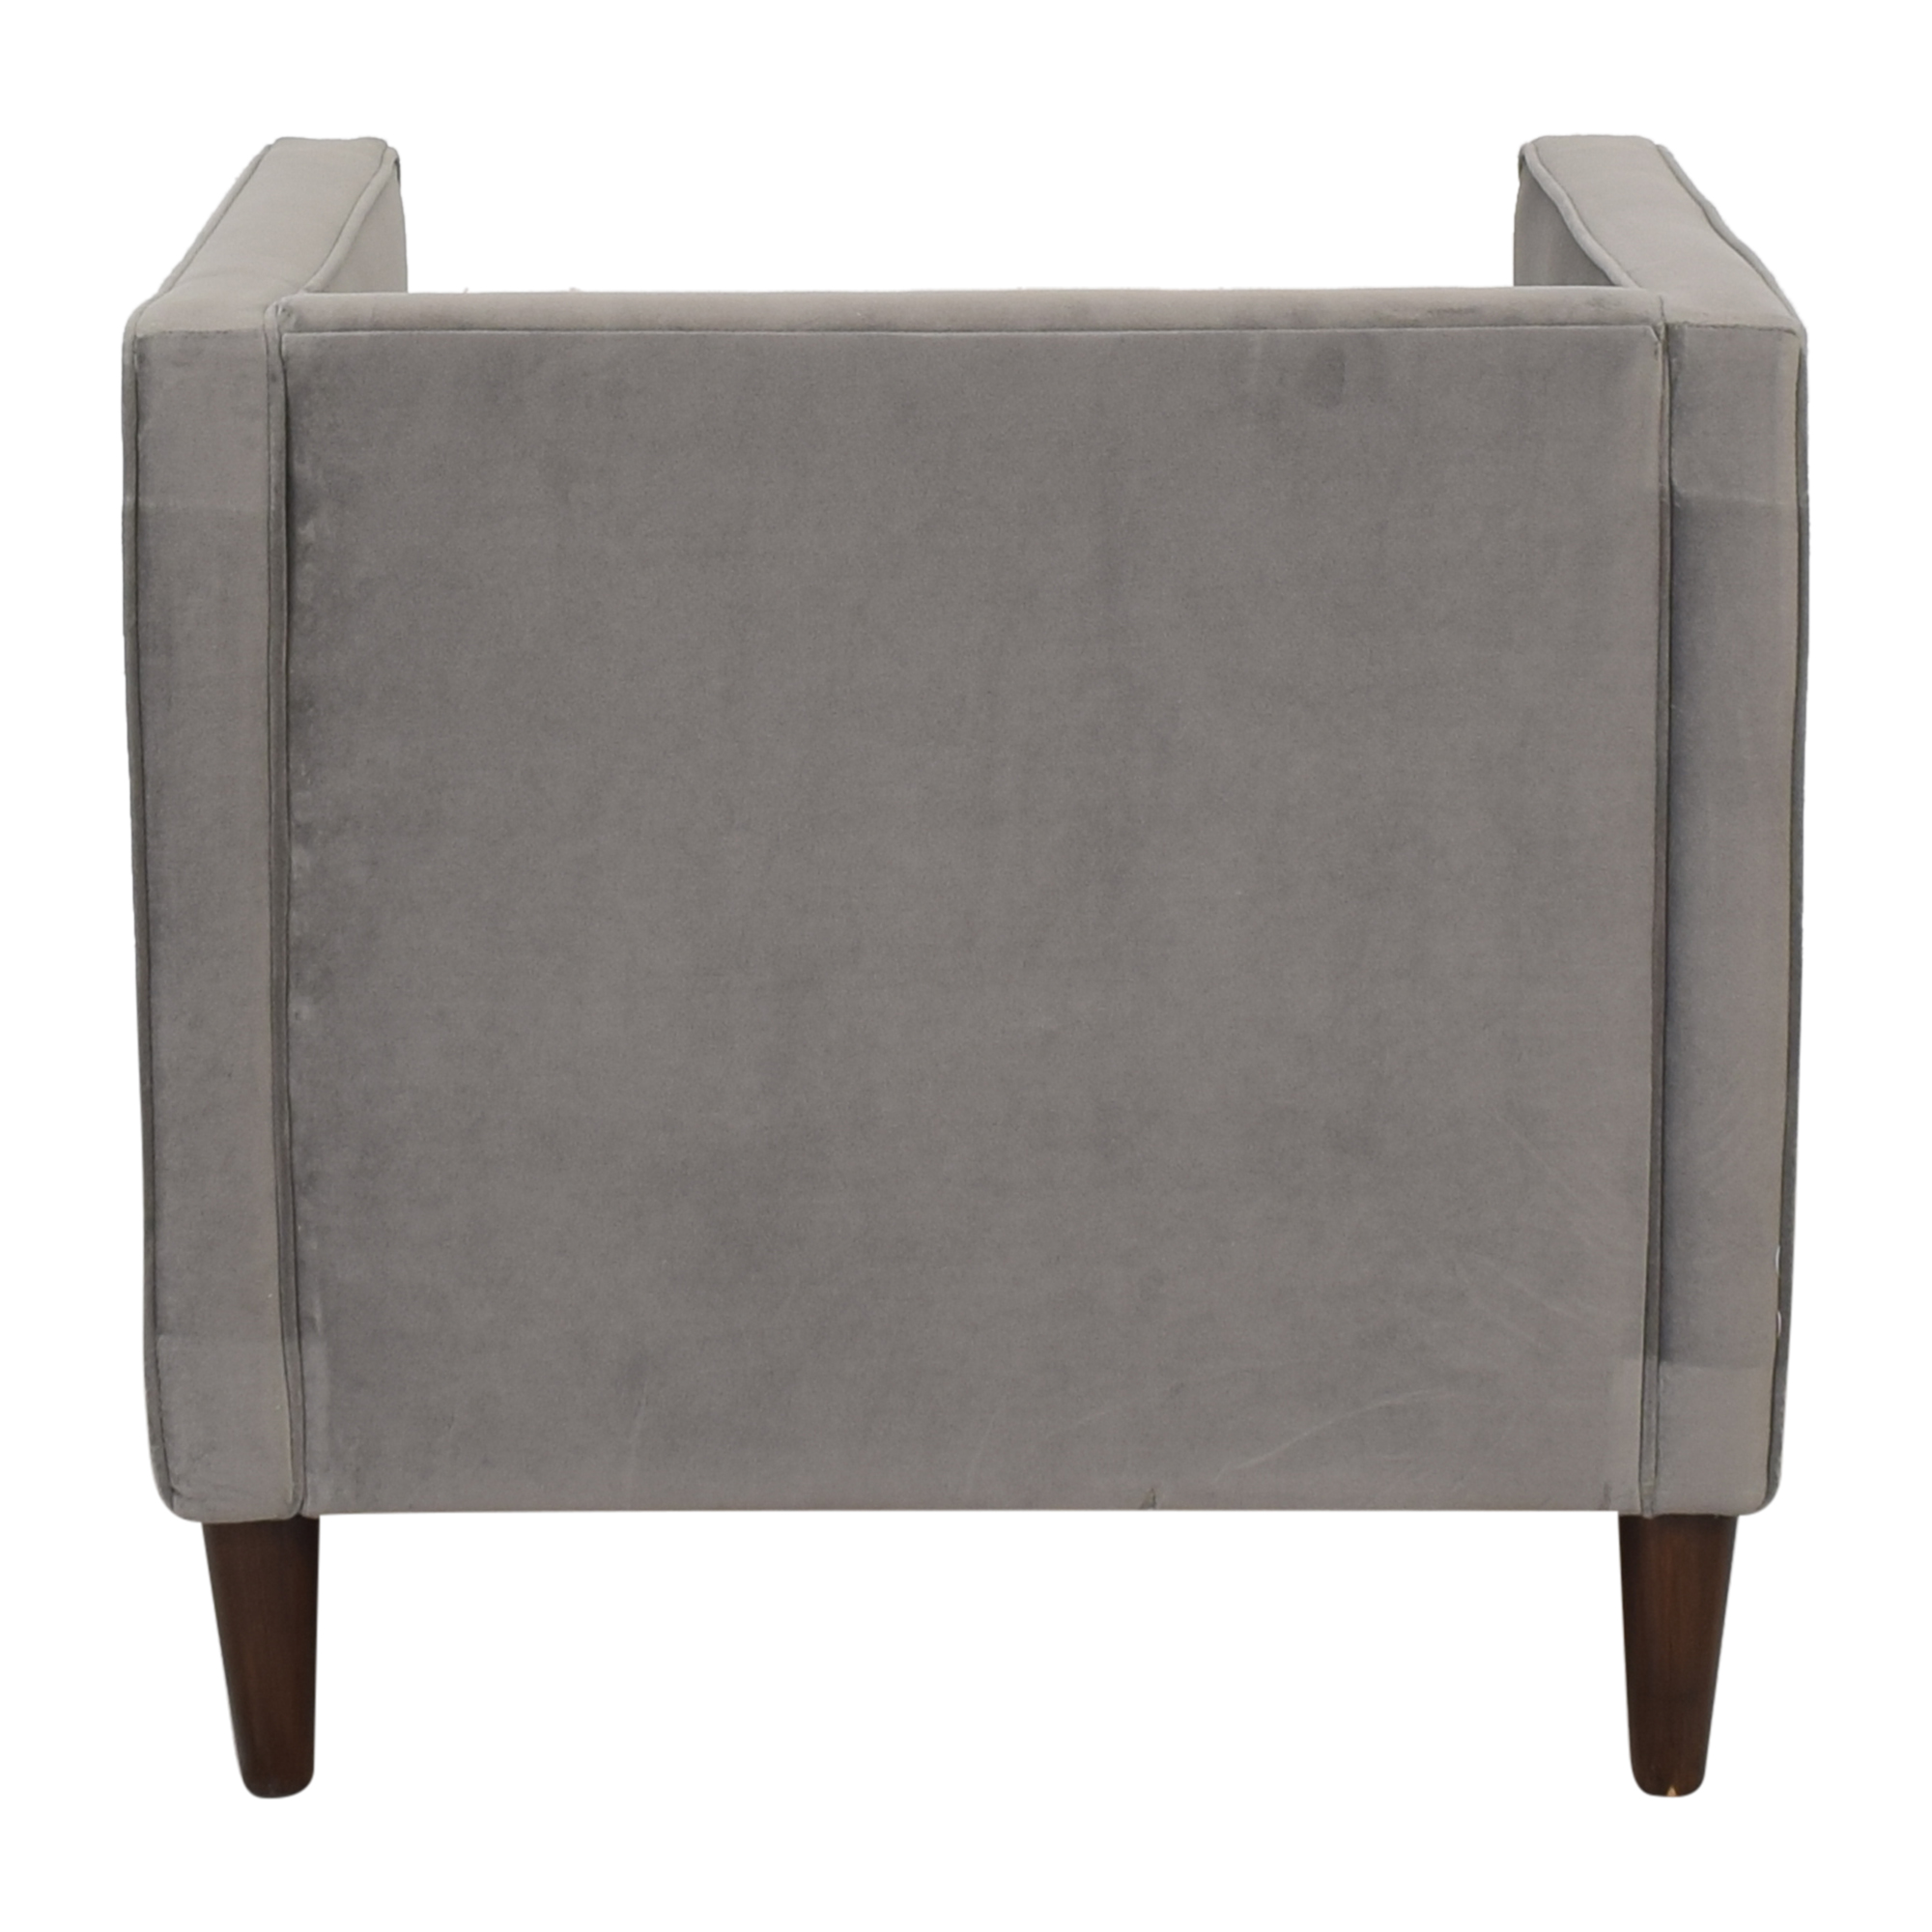 The Inside The Inside Tuxedo Chair grey